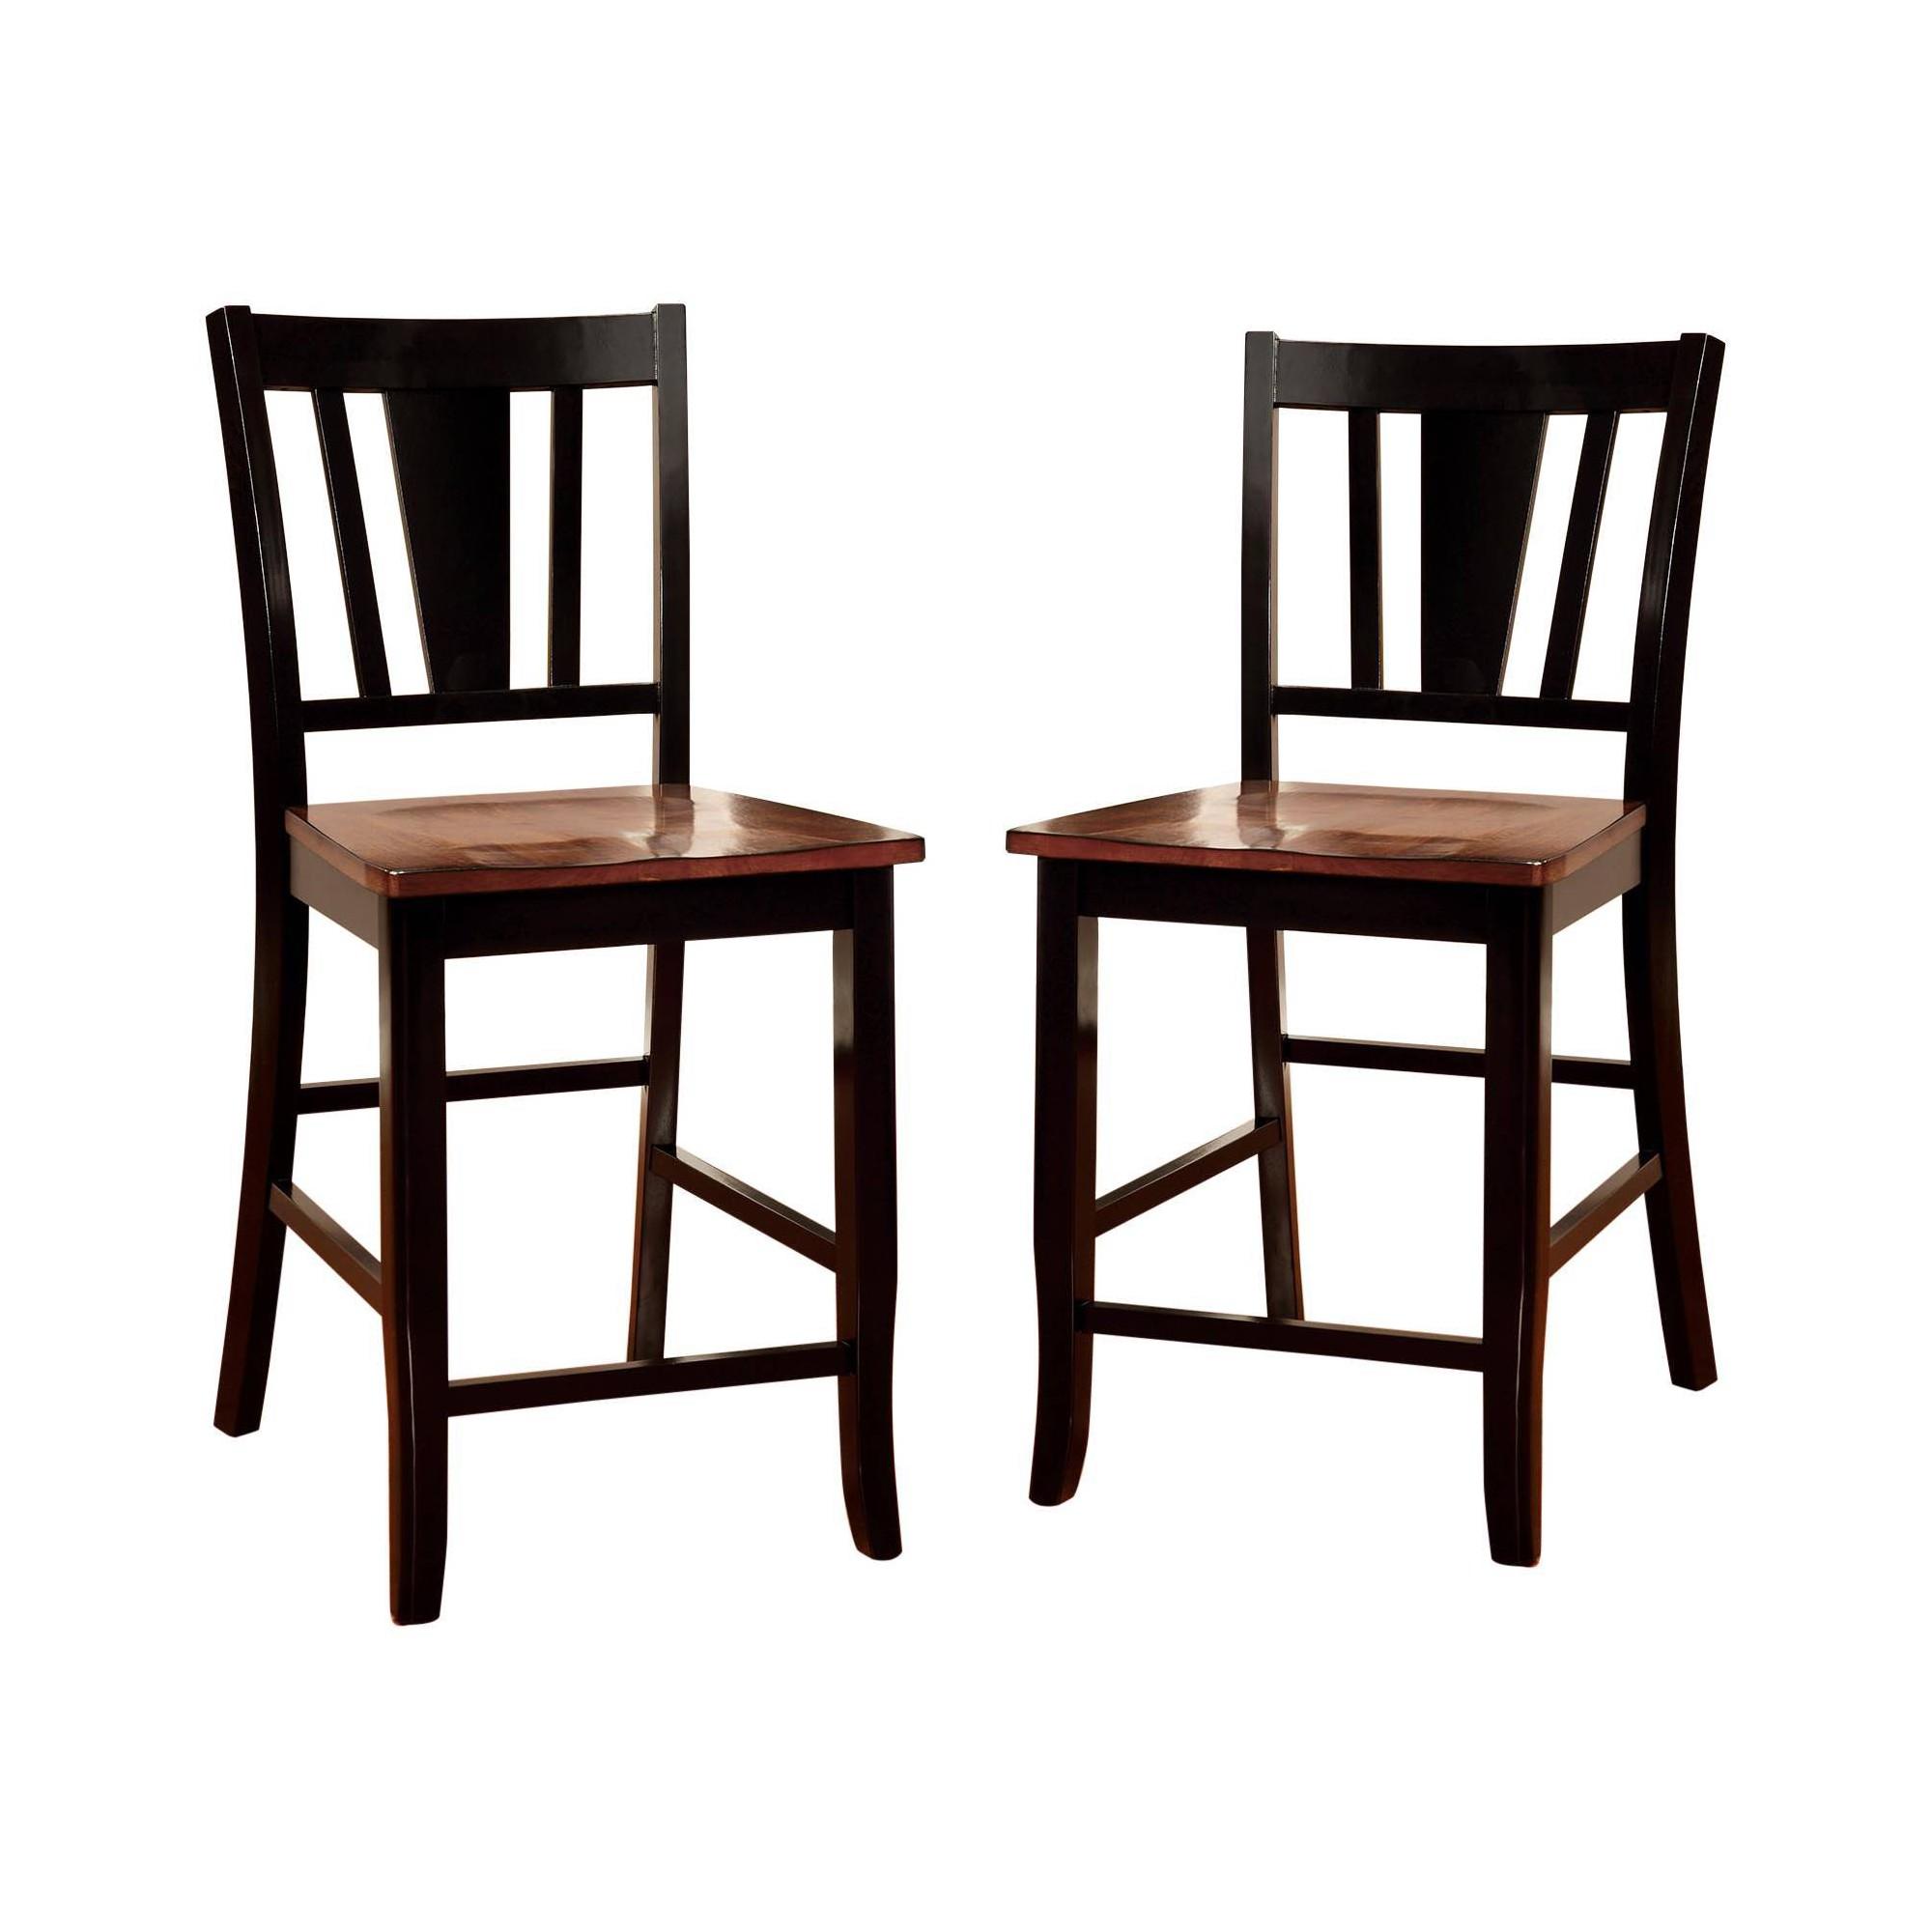 Set of 2 Earlton Striped Cutout Back Counter Side Chair Cherry/Black - Sun & Pine